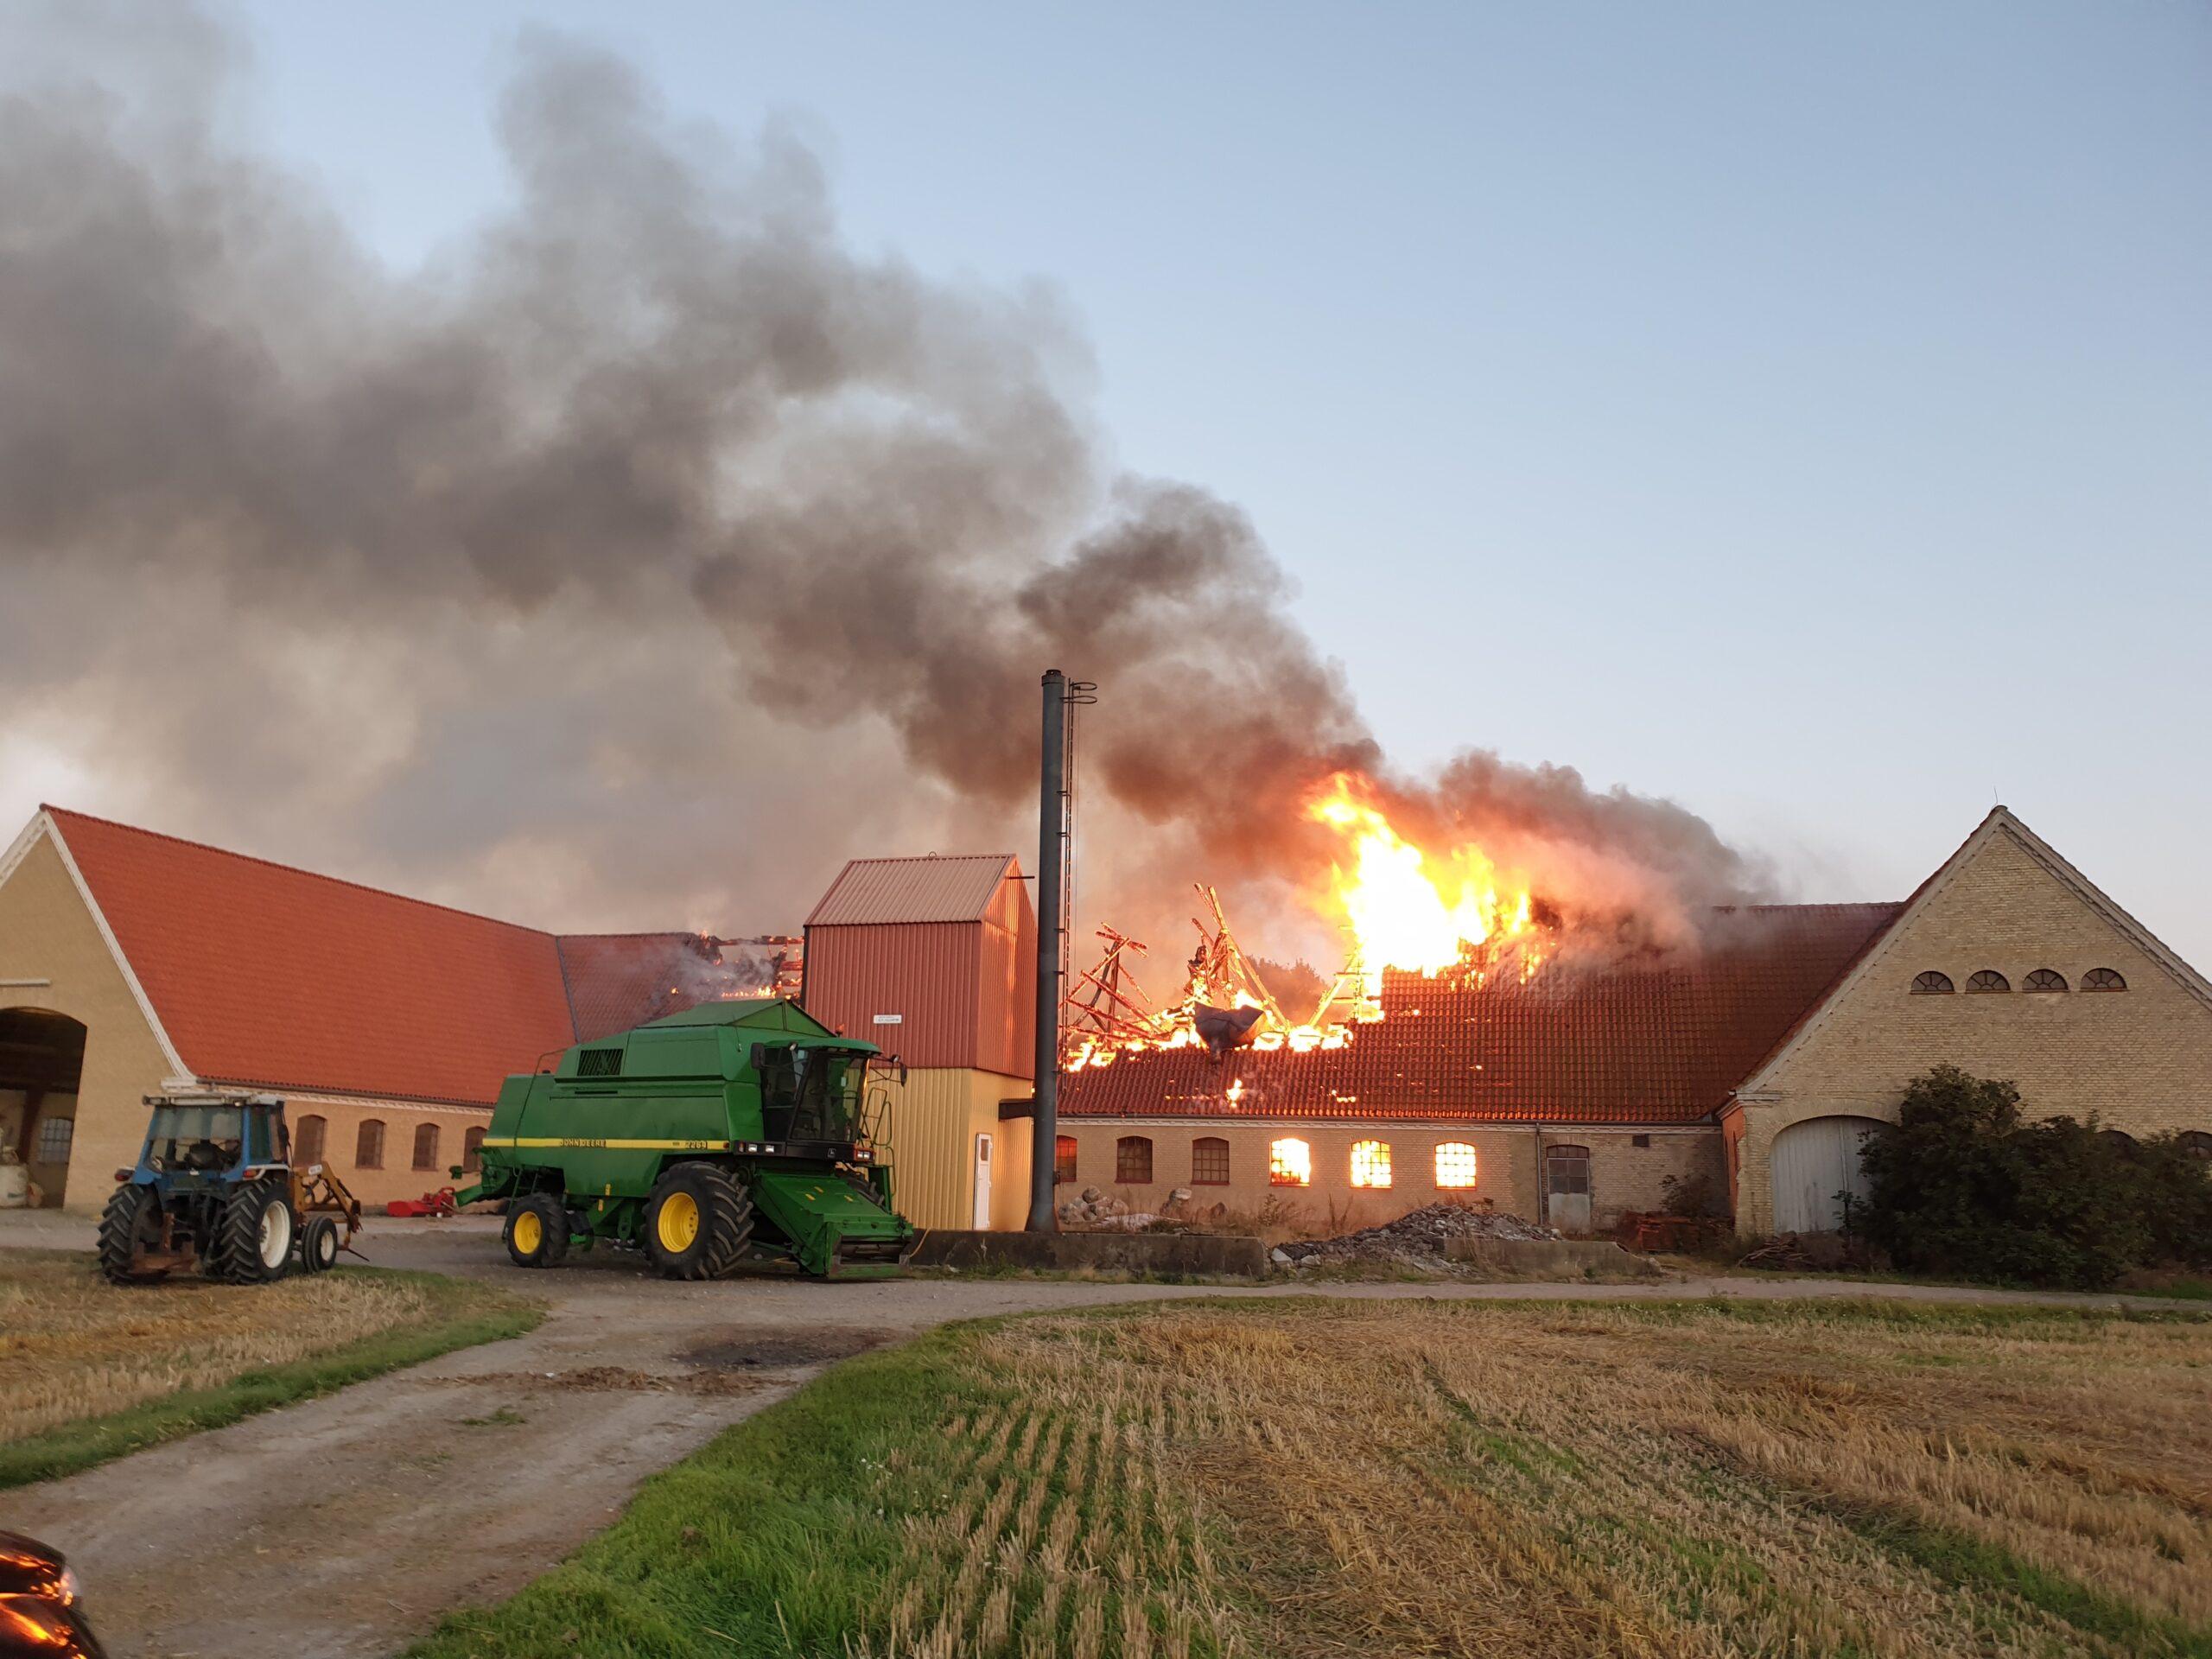 Heftig gårdbrand - brandvæsnet kæmper mod flammerne i Gedser